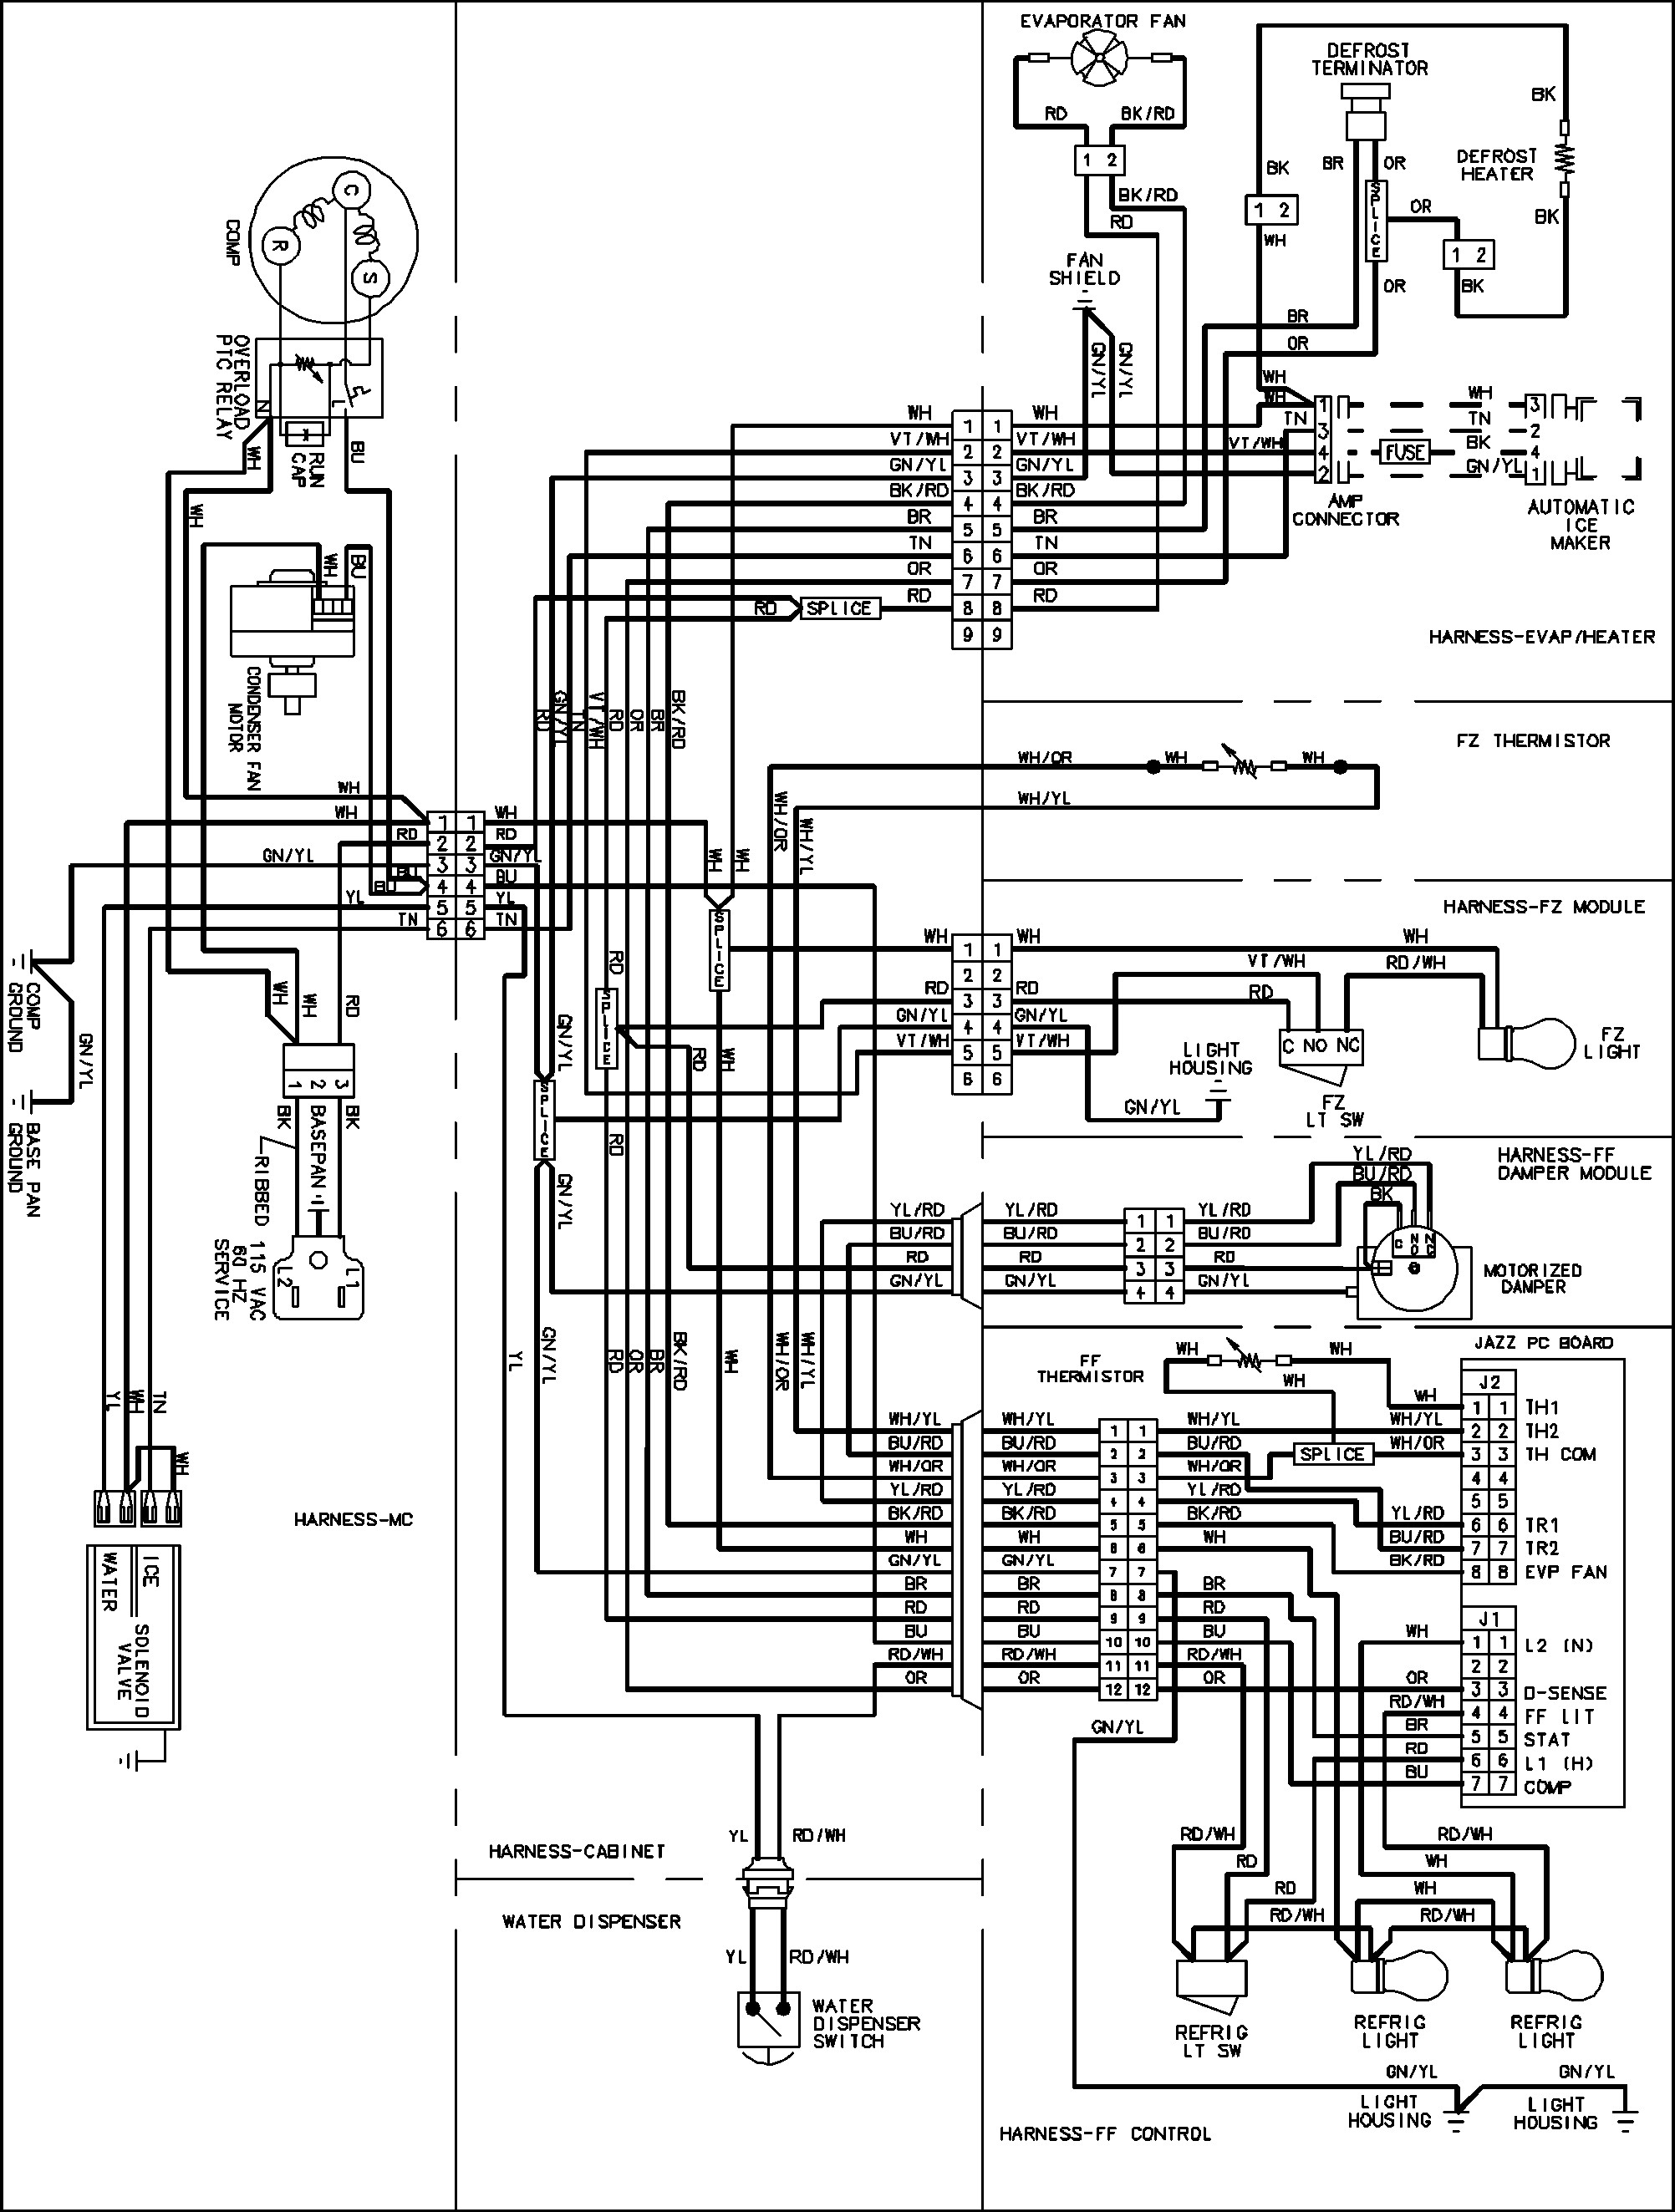 whirlpool refrigerator wiring schematic free wiring diagram Ice Maker Circuit